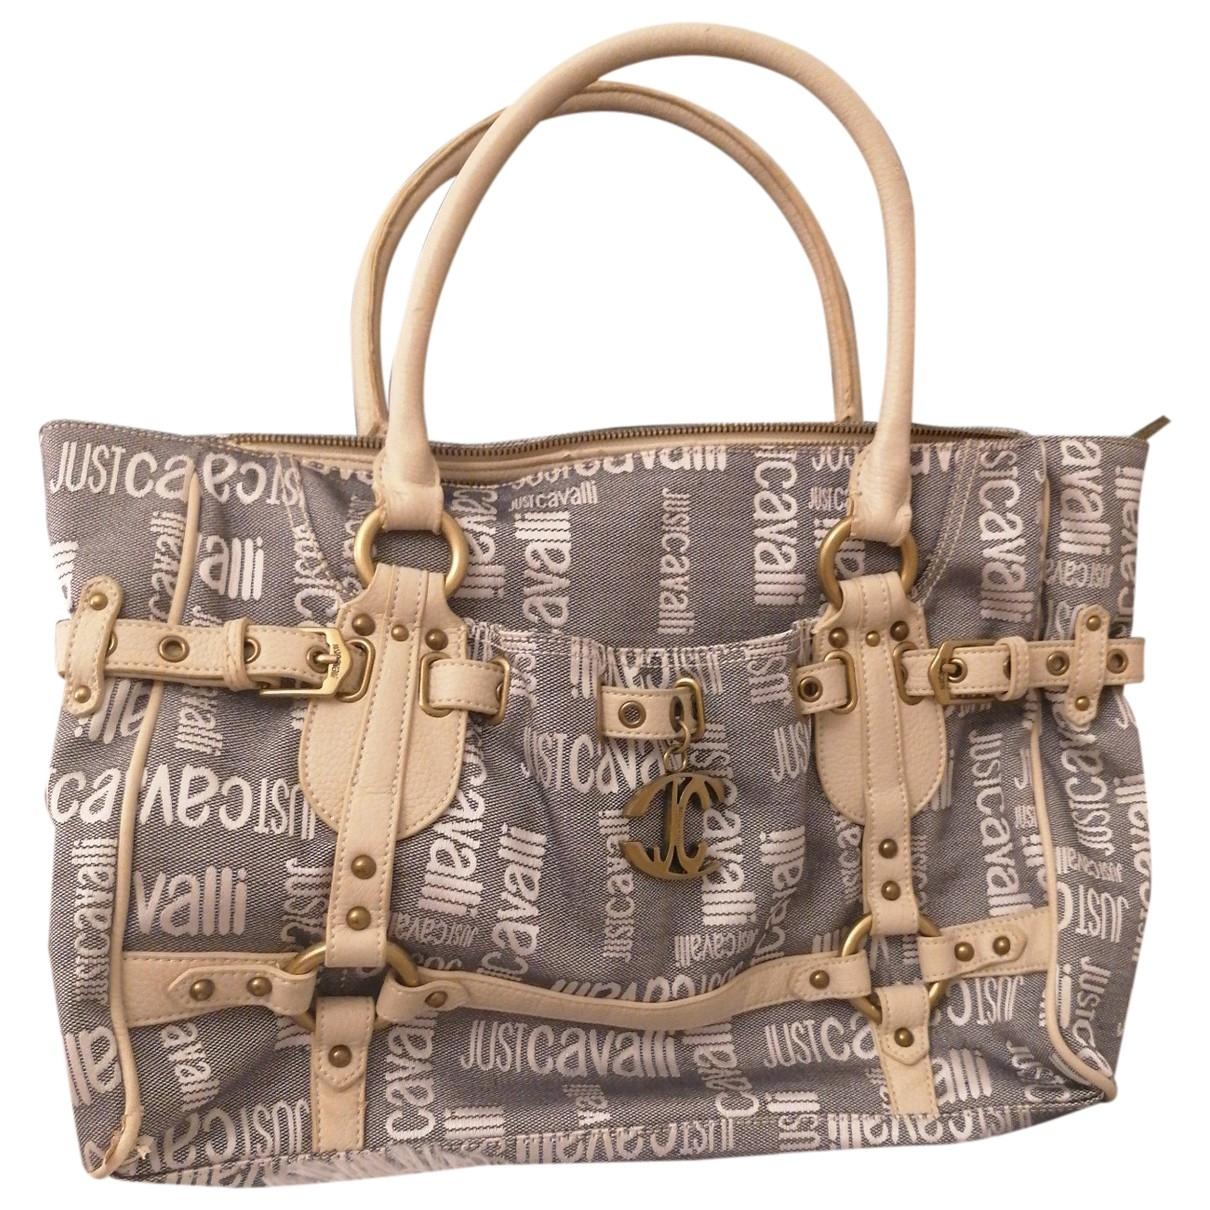 Just Cavalli \N Blue Denim - Jeans handbag for Women \N